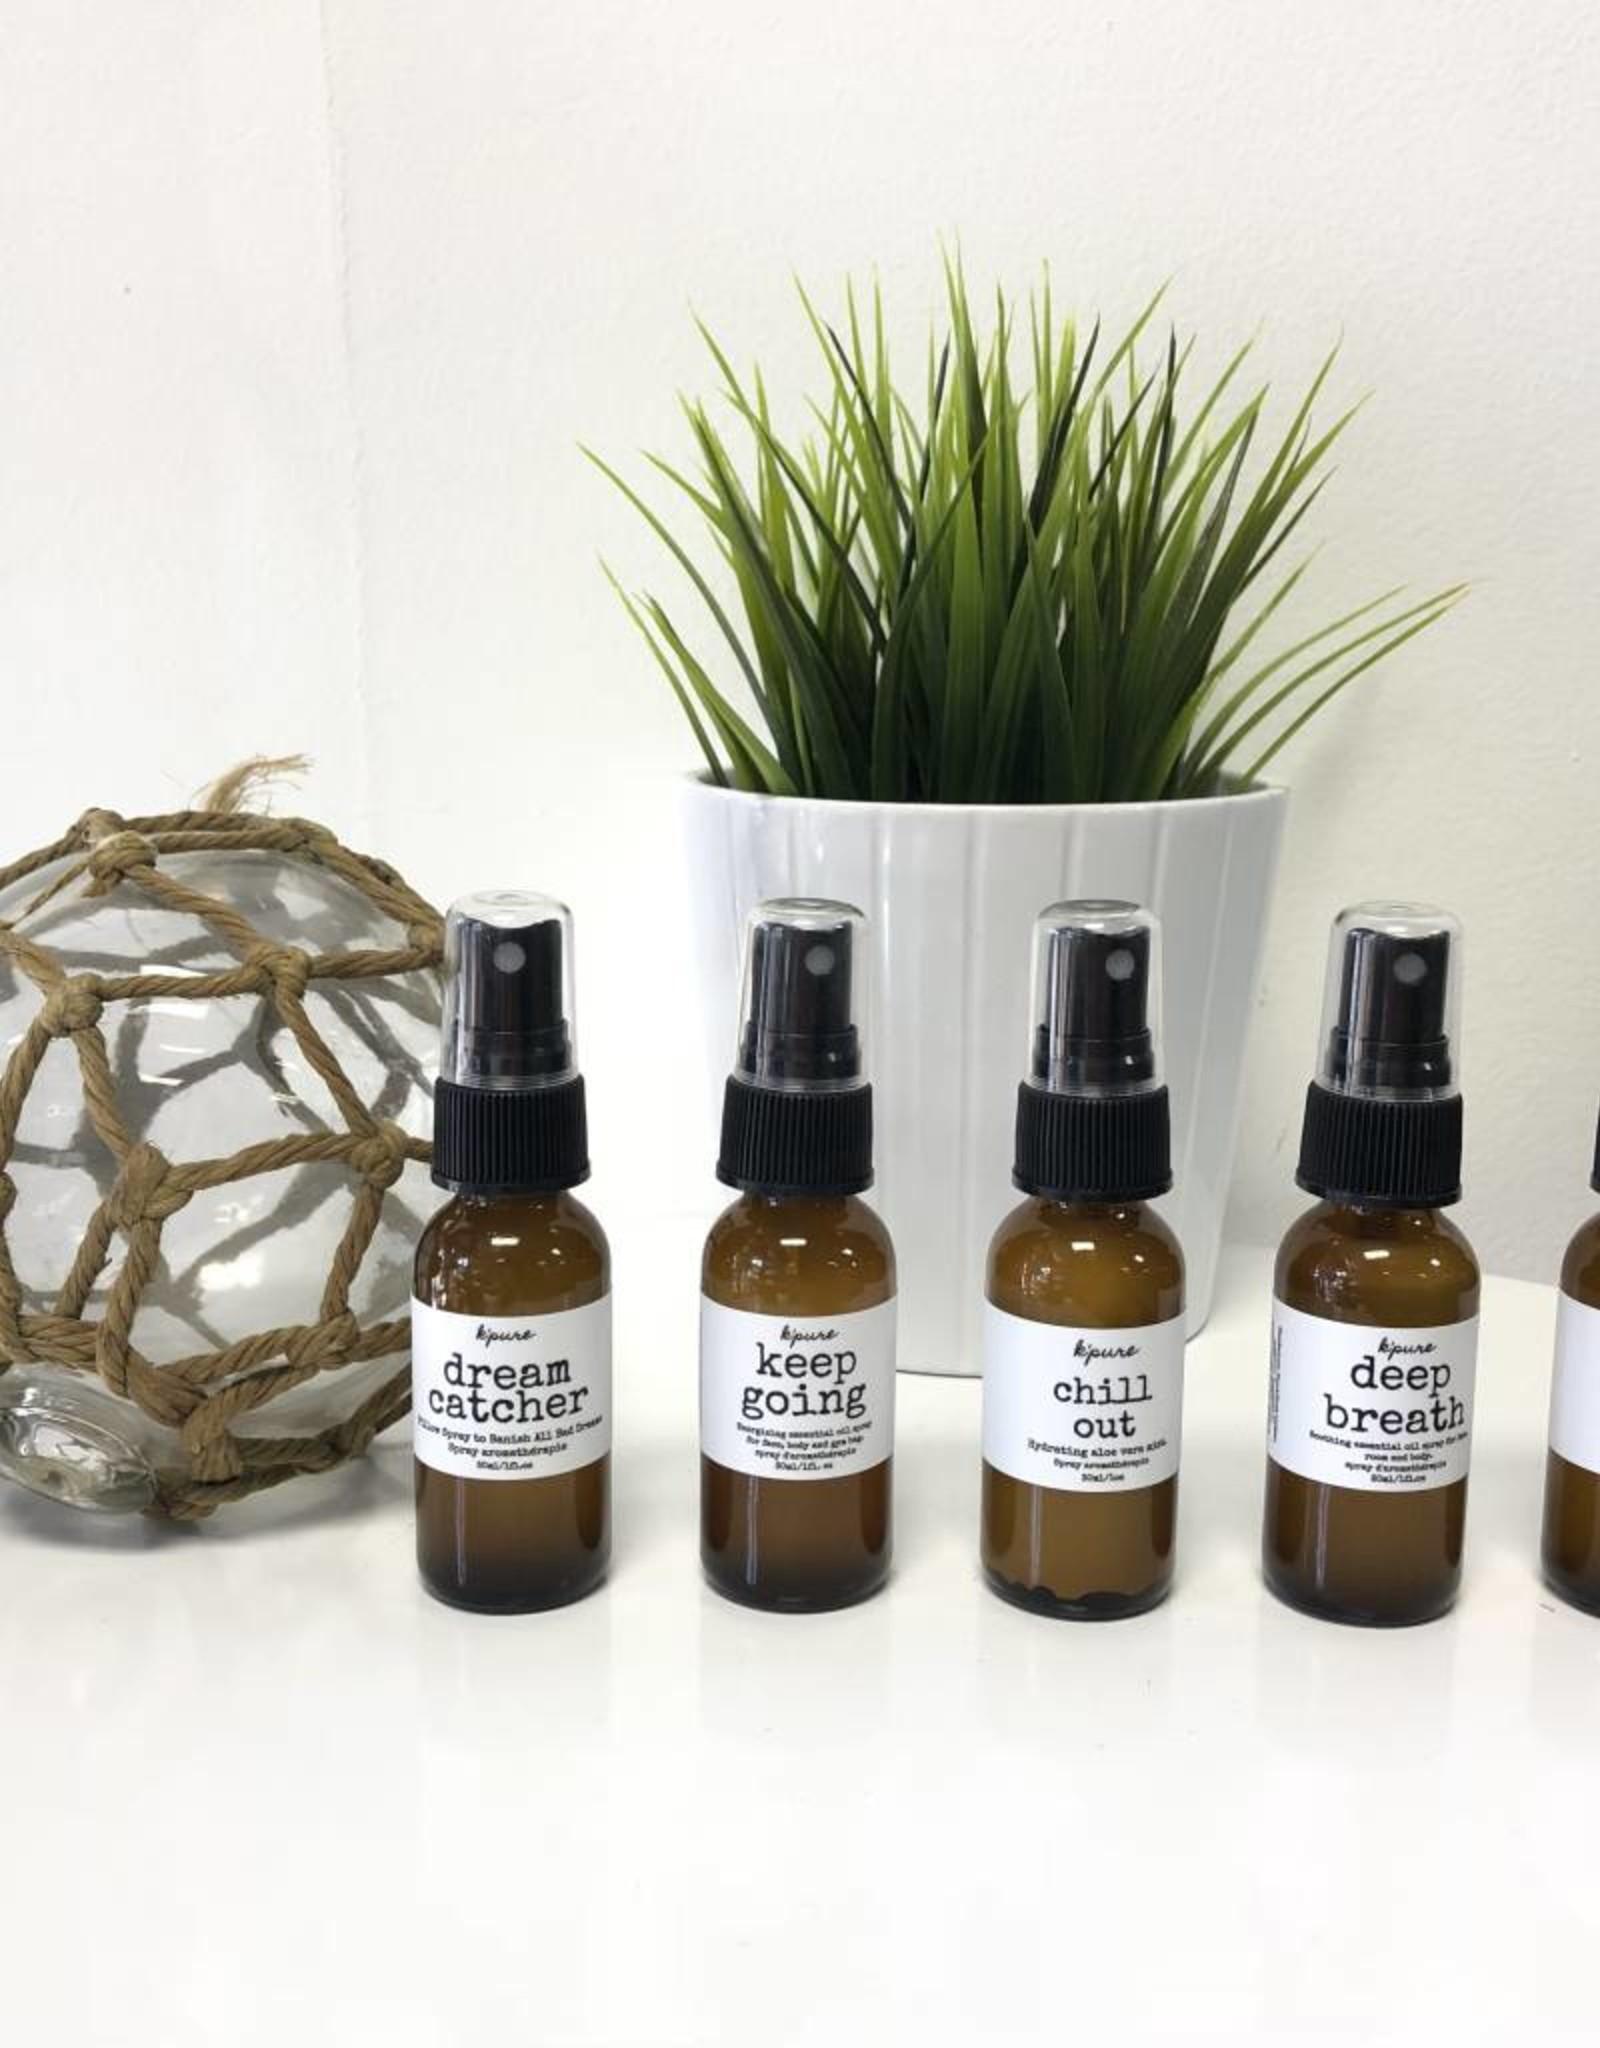 K'PURE DEEP BREATH essential oil spray, 1oz